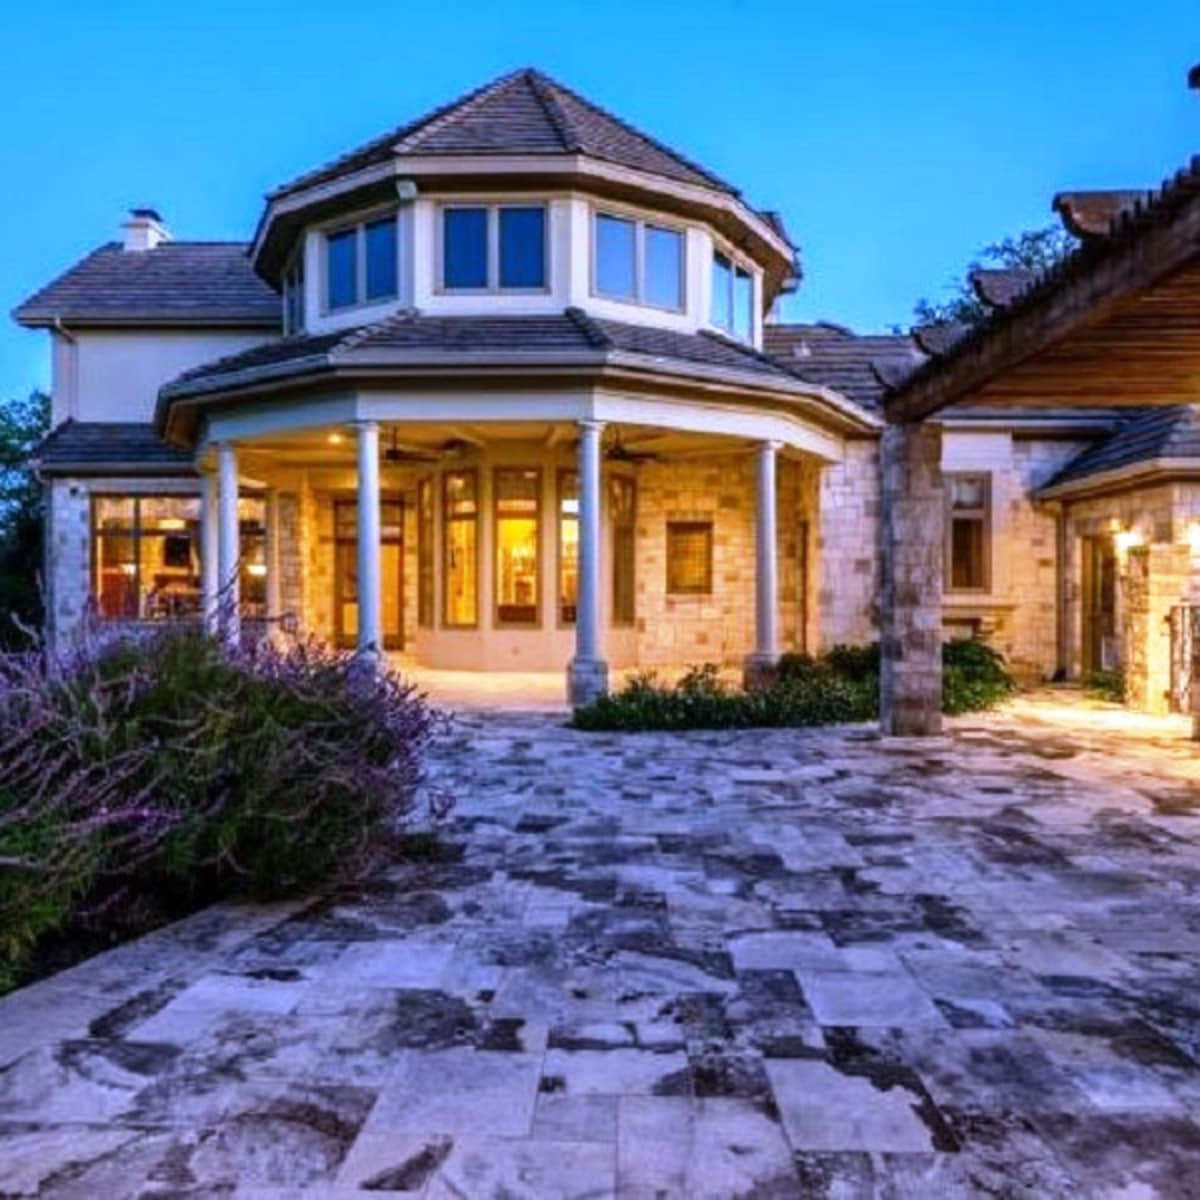 RENTCafe Most Expensive Rental Homes Texas September 2015 1704 Barton Creek Boulevard 78735